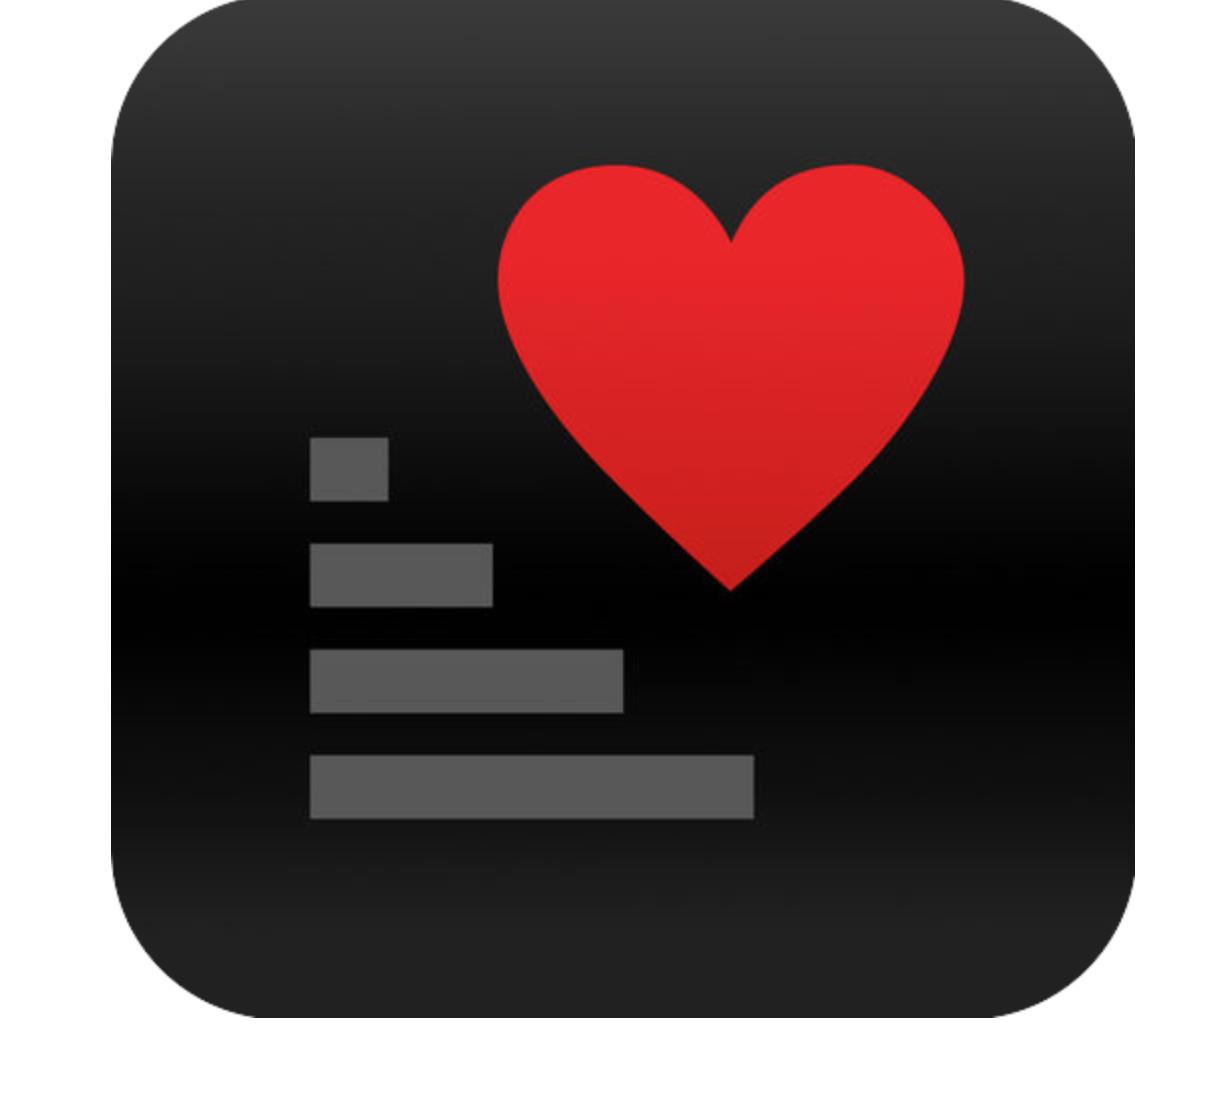 HeartWatch 2 una killer app per il vostro Apple Watch ...